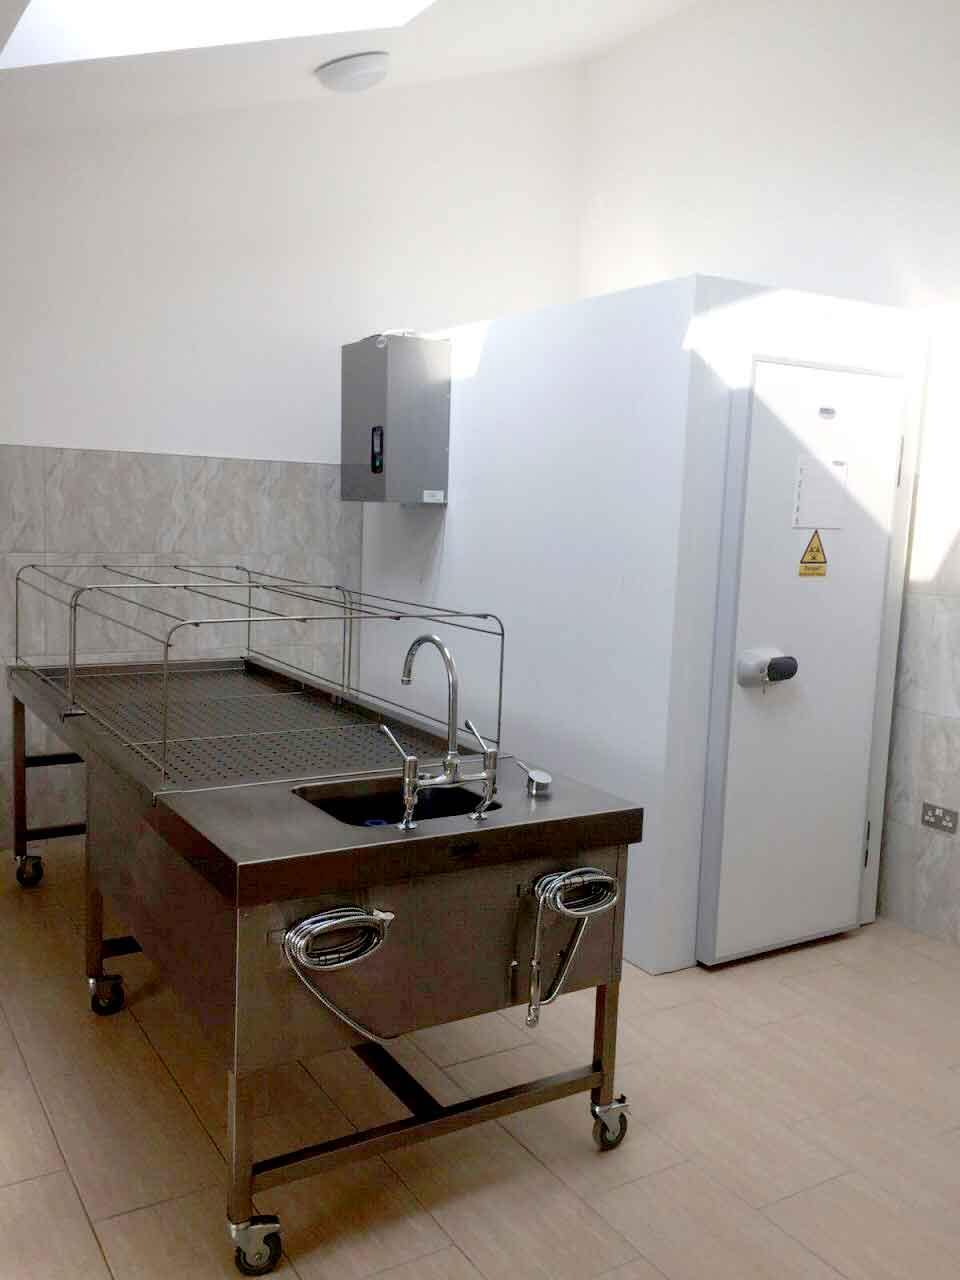 Ghusal Room, Ghusal Table, Islaic Washing room, Islamic Mortuary